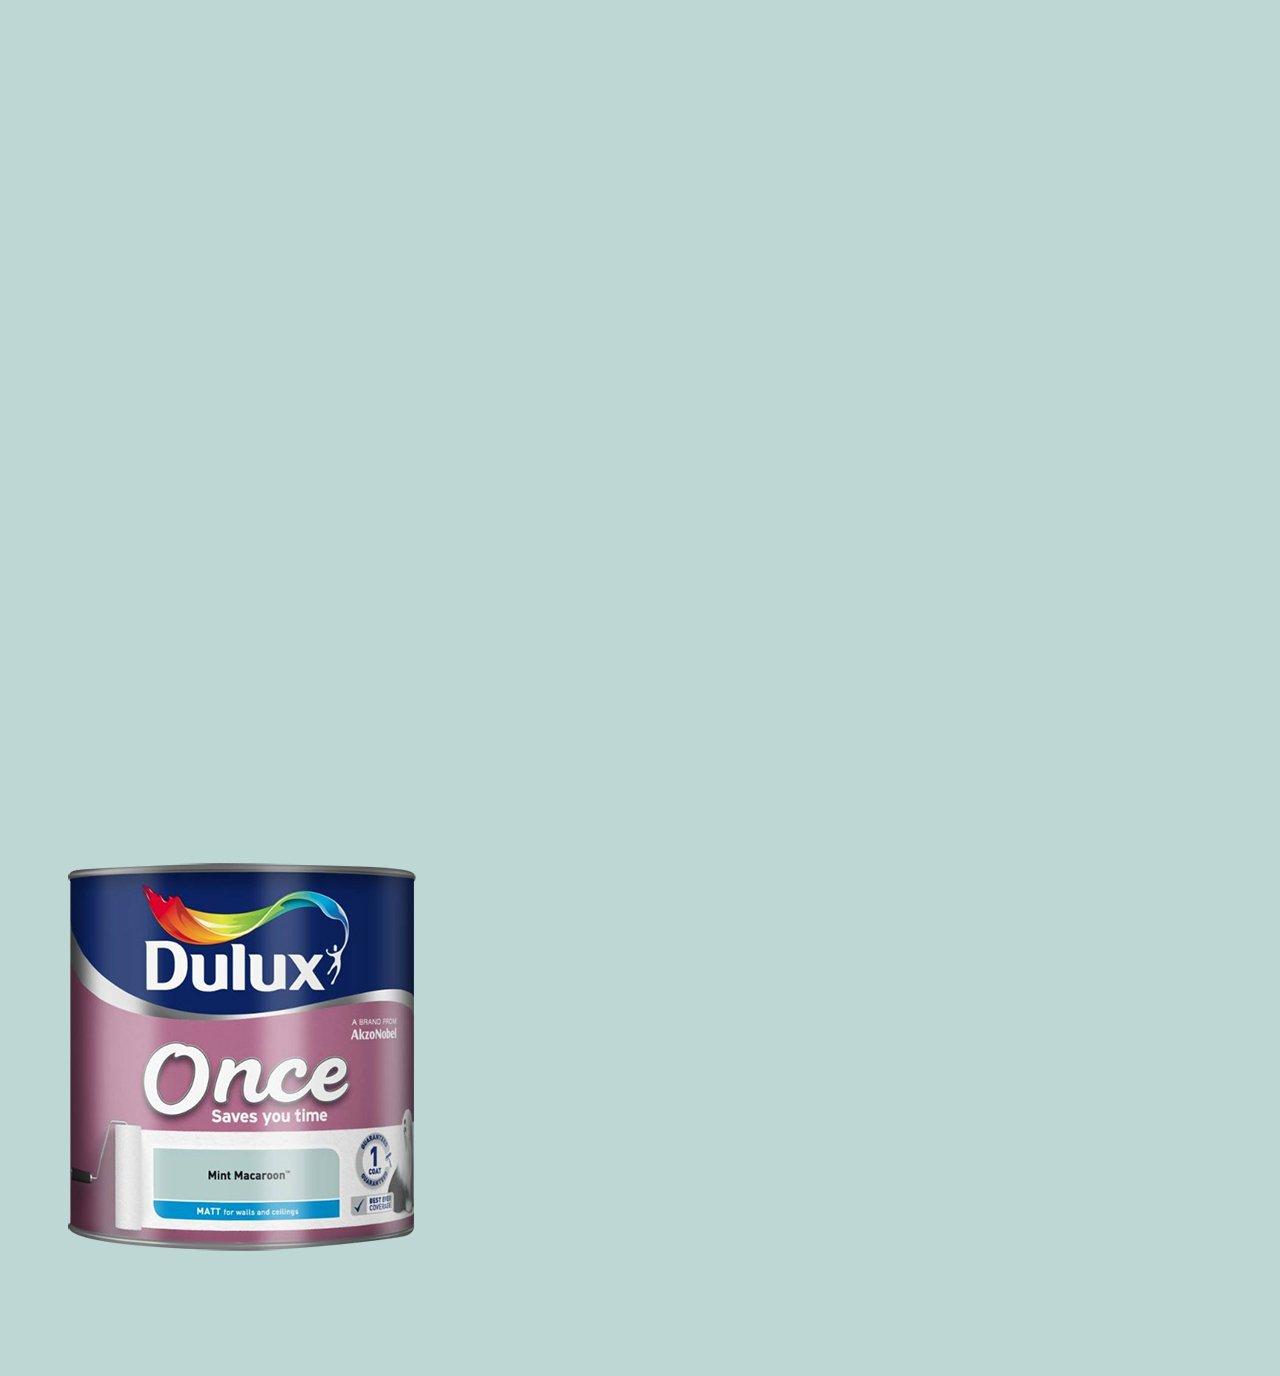 Dulux Once Matt Paint for Walls, 2.5 L - Mint Macaroon: Amazon.co ...